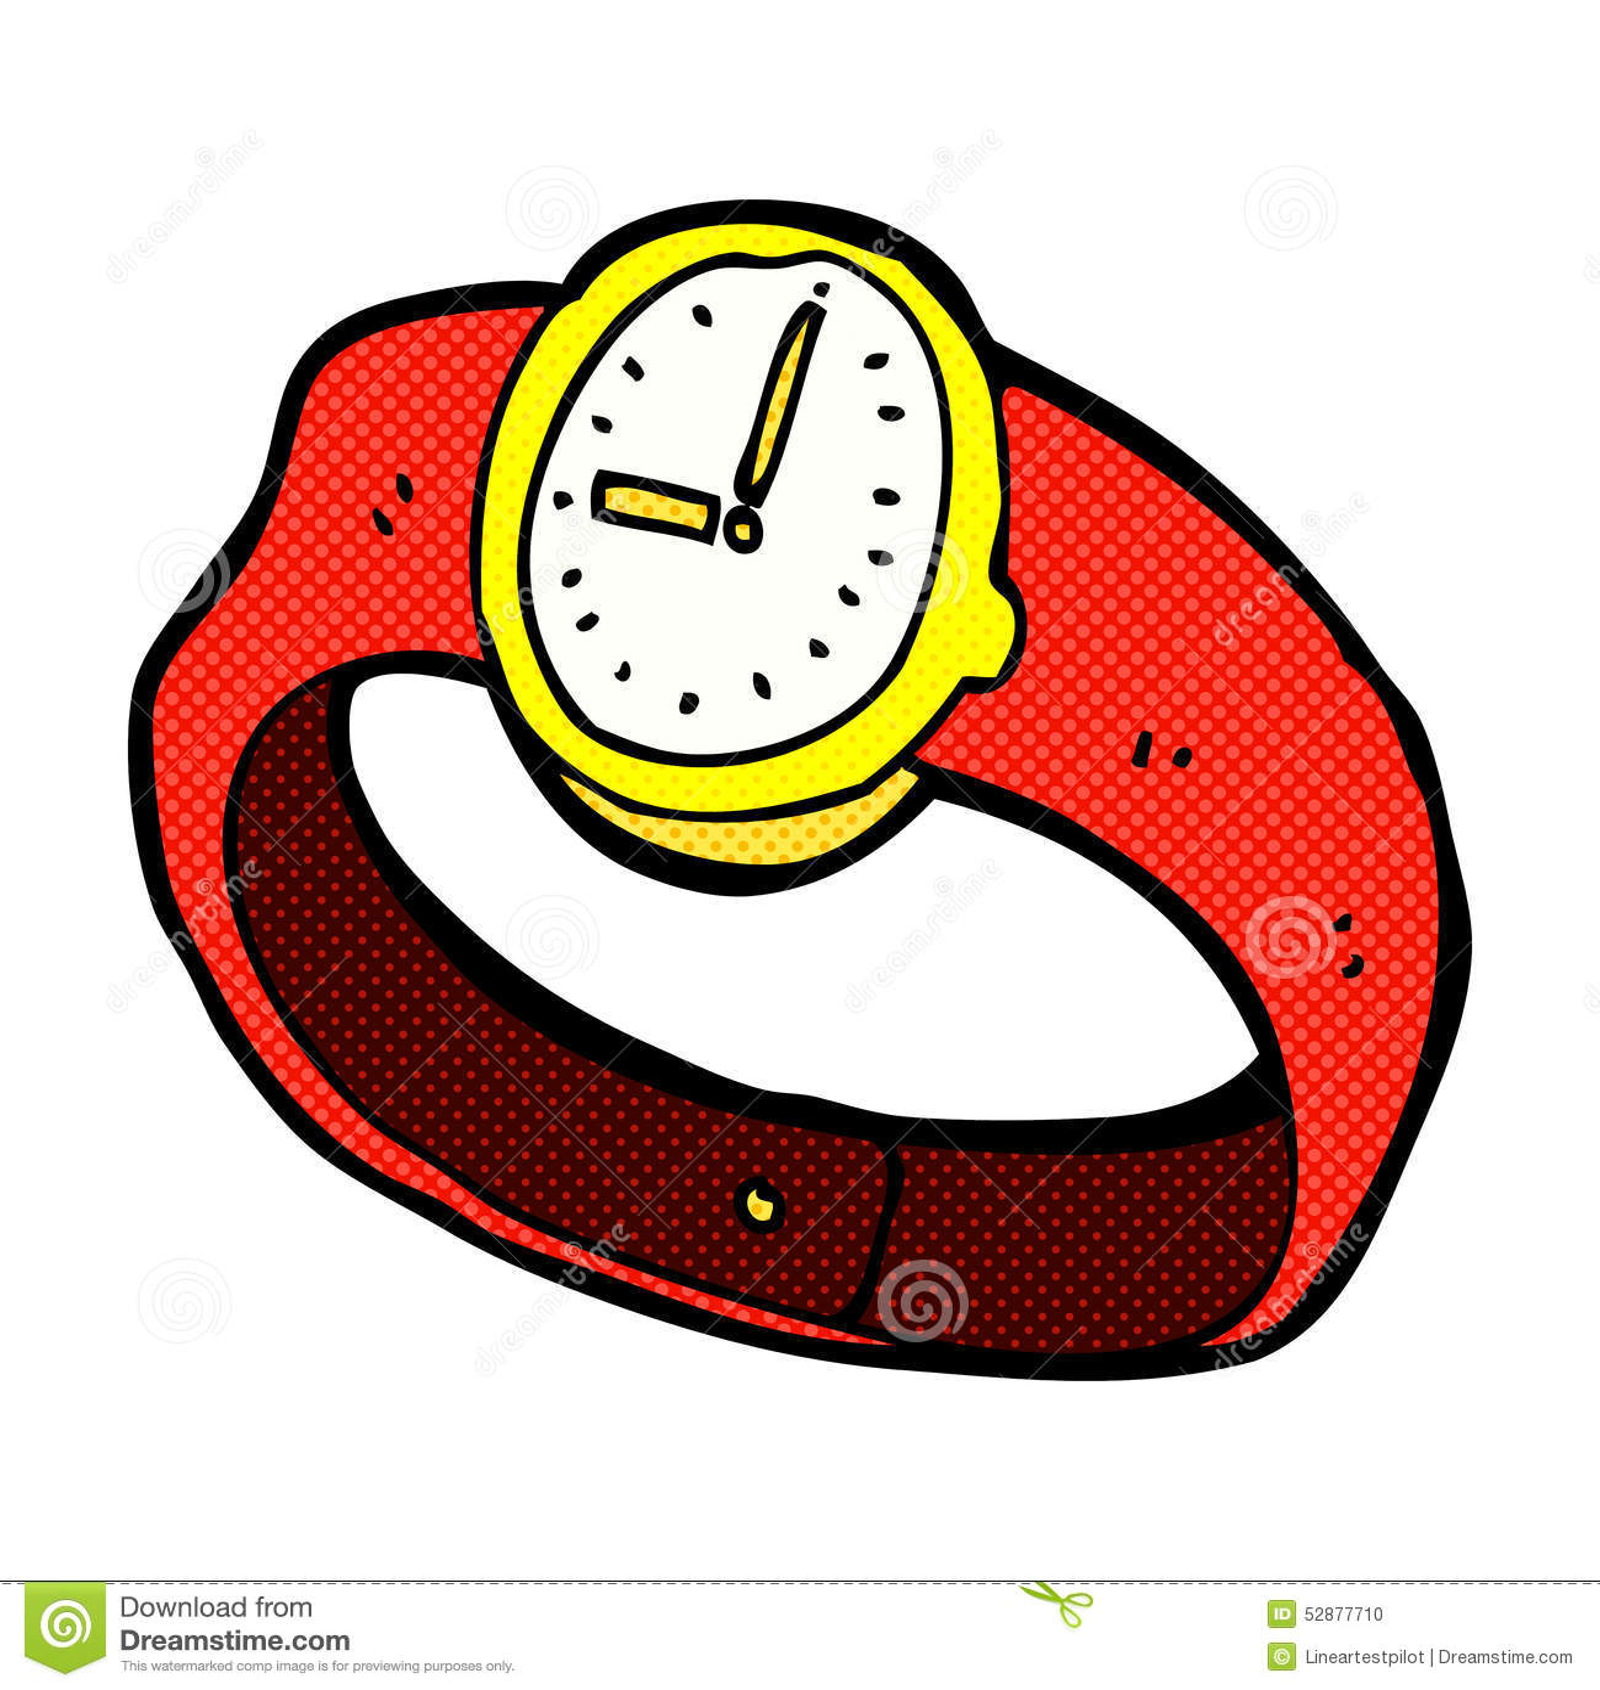 Comic cartoon wrist watch stock illustration illustration of print 52877710 for Cartoon watches